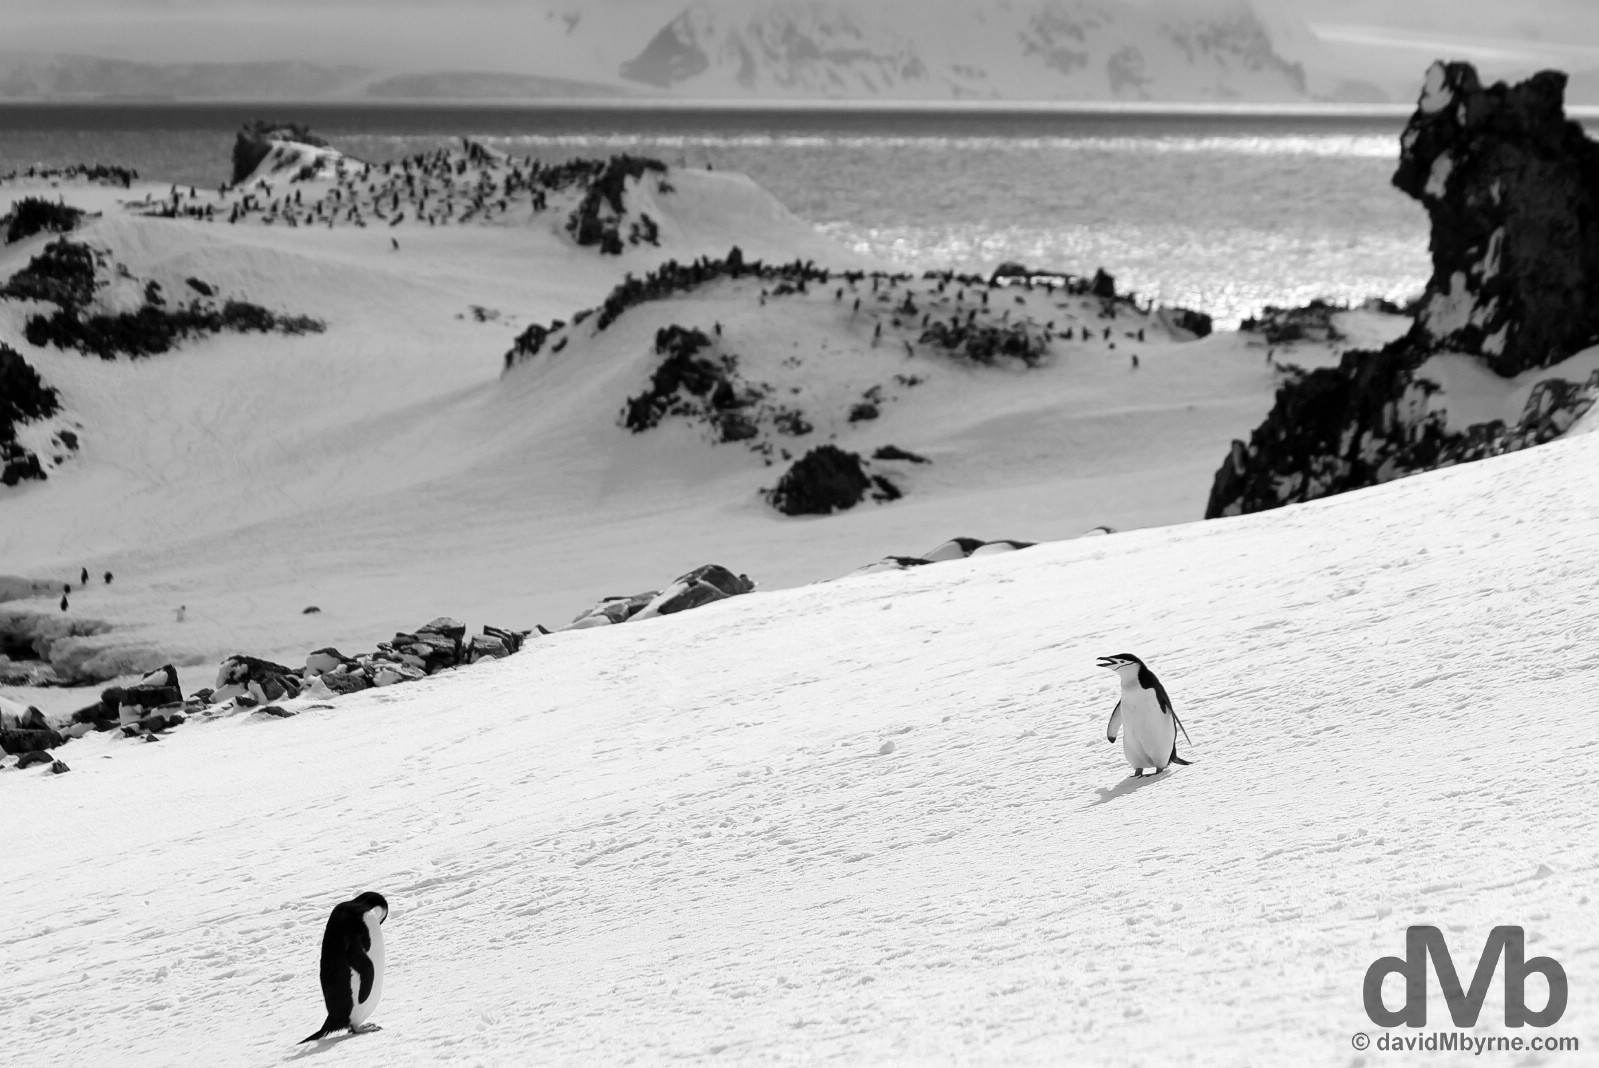 Chinstrap penguins on Half Moon Island, South Shetland Islands, Antarctica. November 29, 2015.